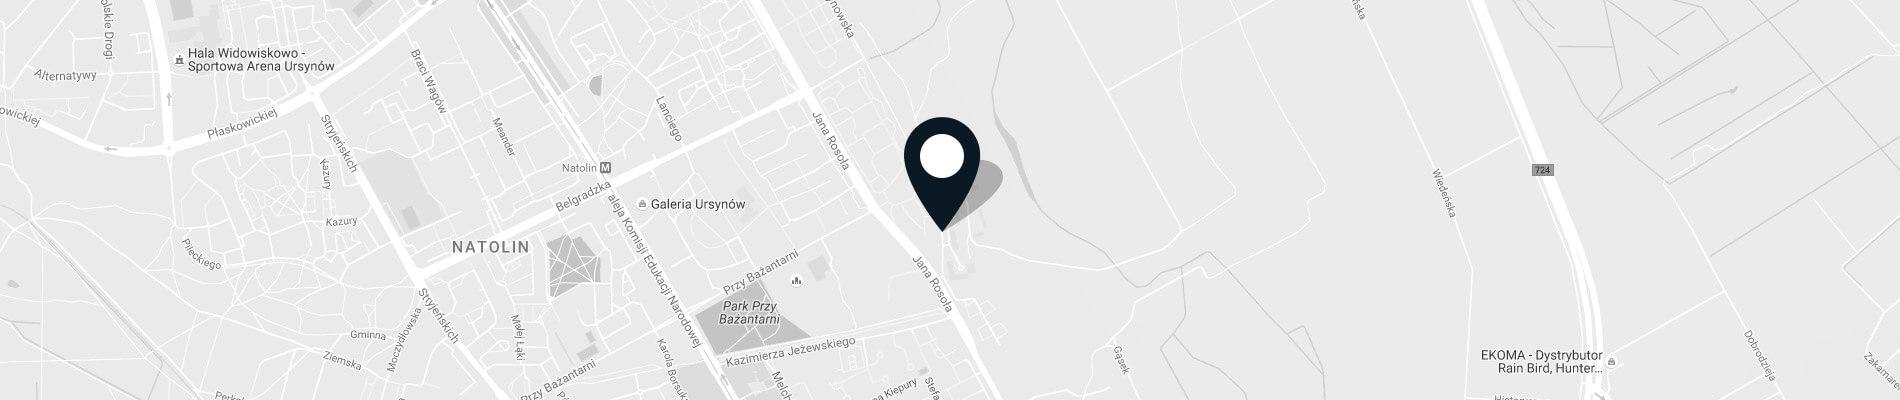 Natolin Campus on map